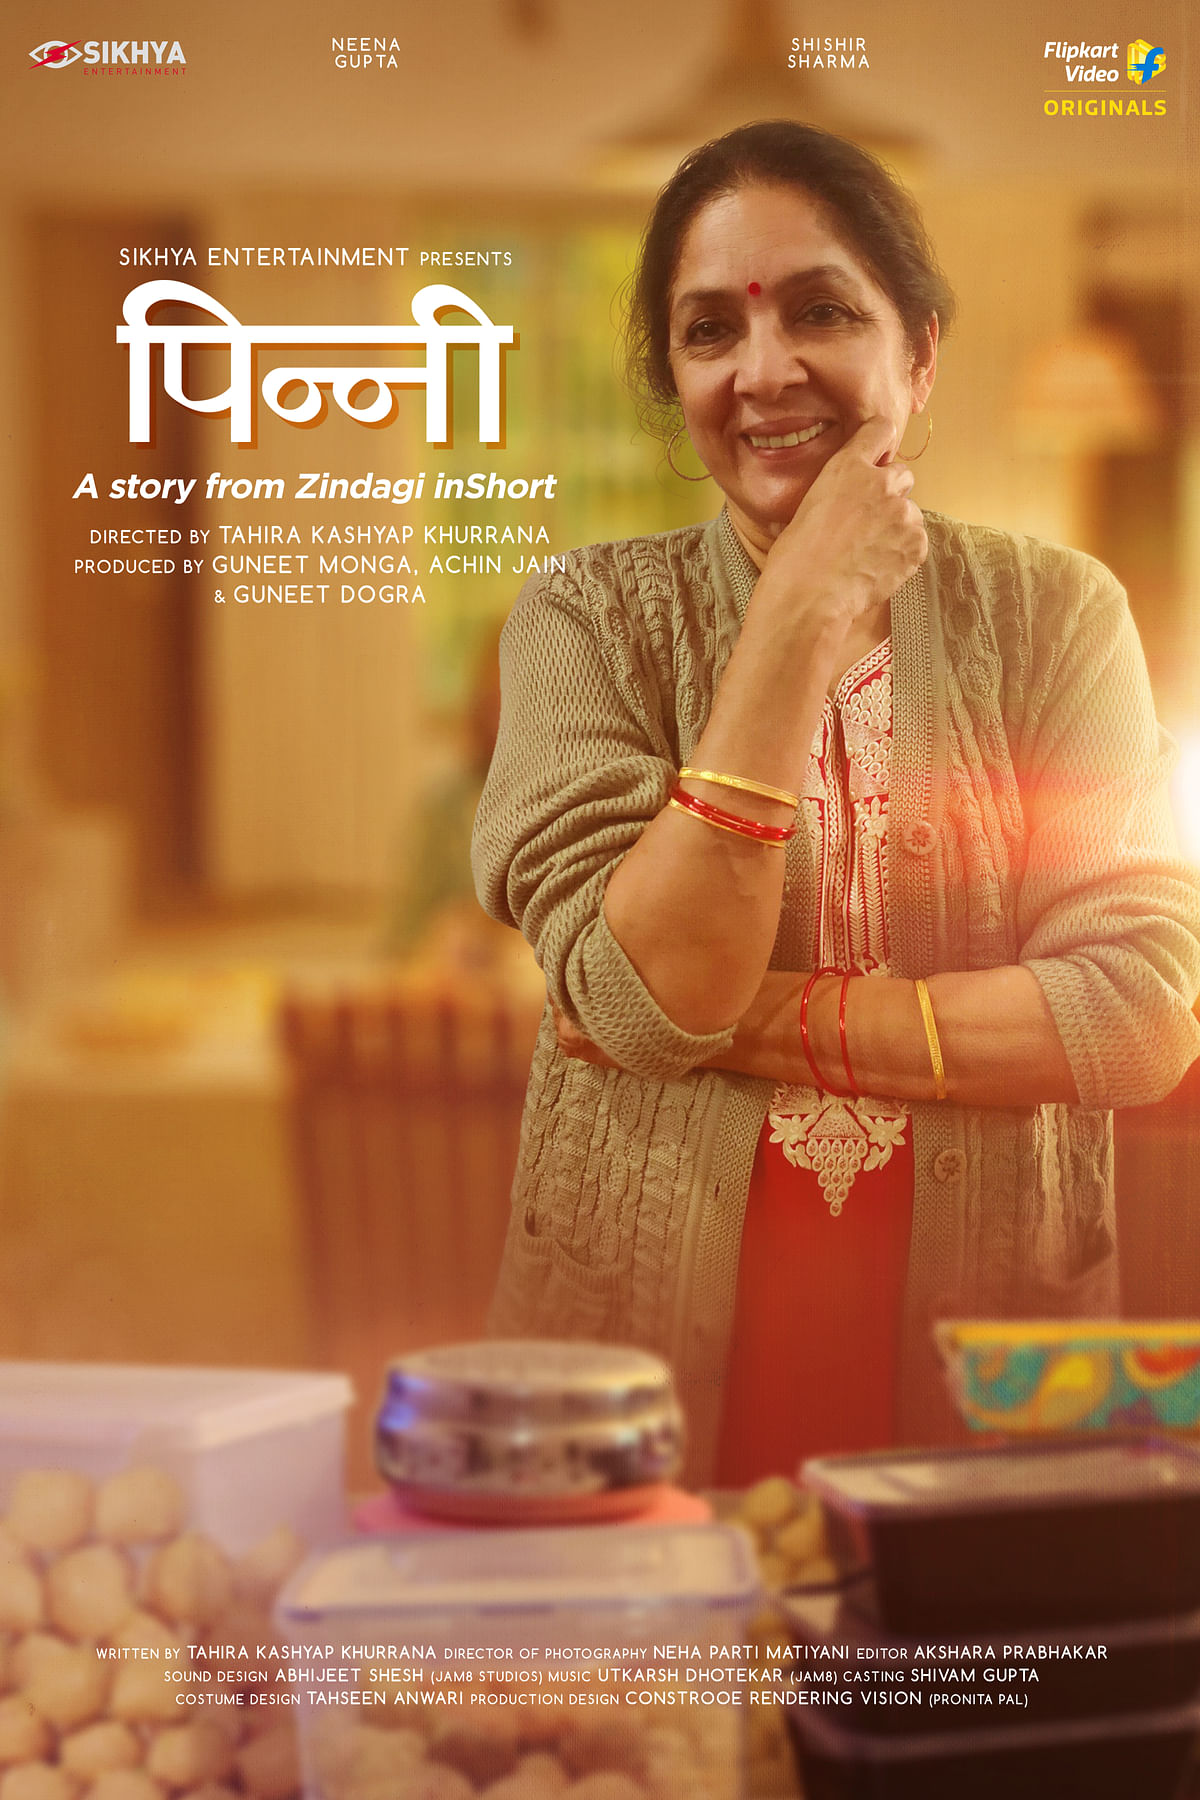 A poster of <i>Pinni </i>directed by Tahira Kashyap Khurrana featuring Neena Gupta.